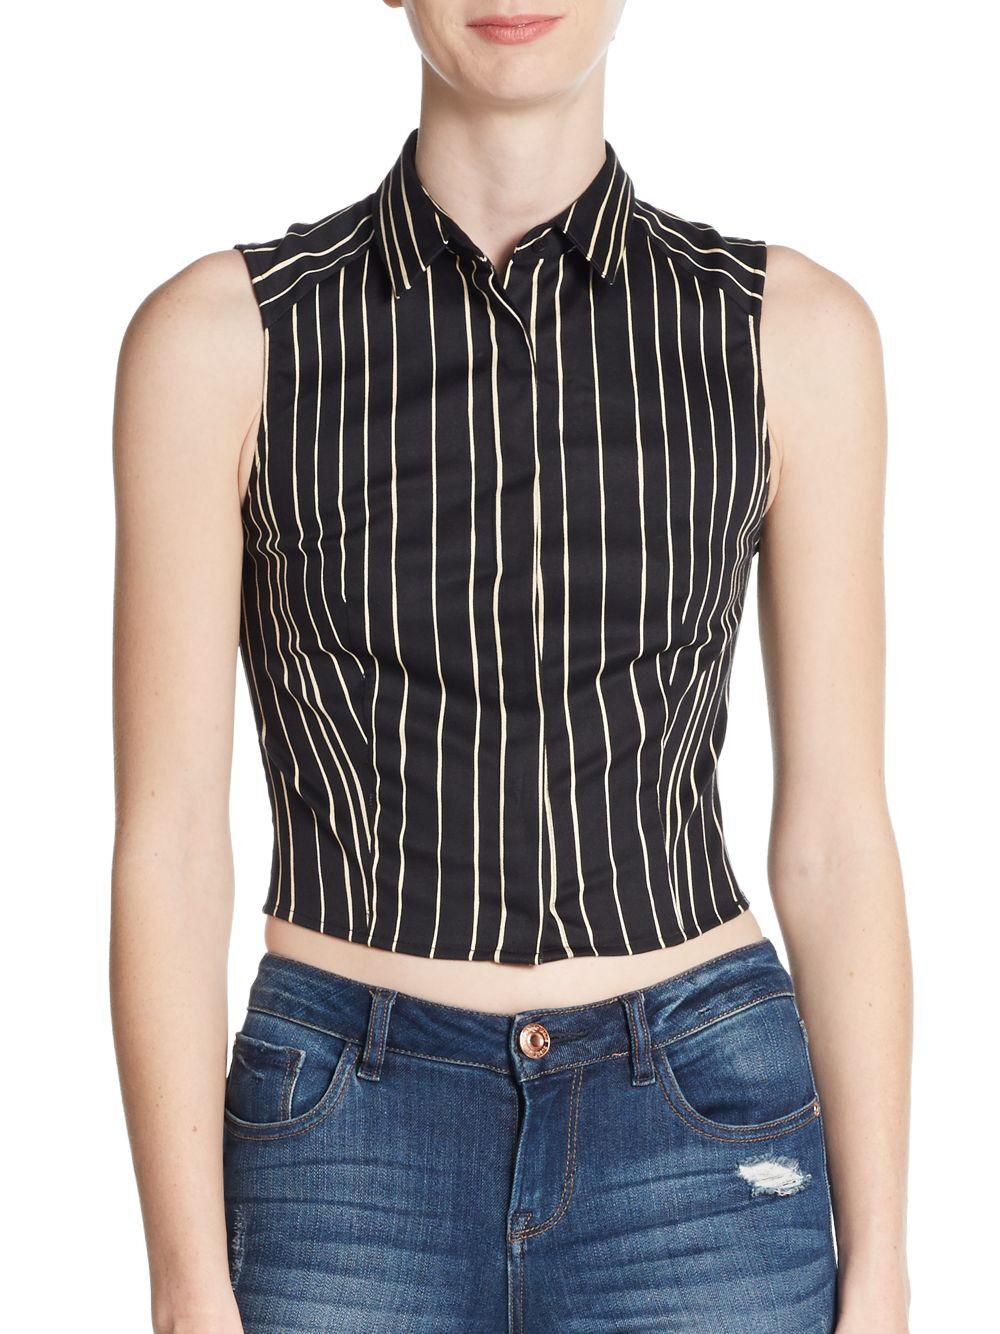 New Alice + Olivia 8 schwarz Beige Striped Stretch Button Down Shirt Lea Crop Top